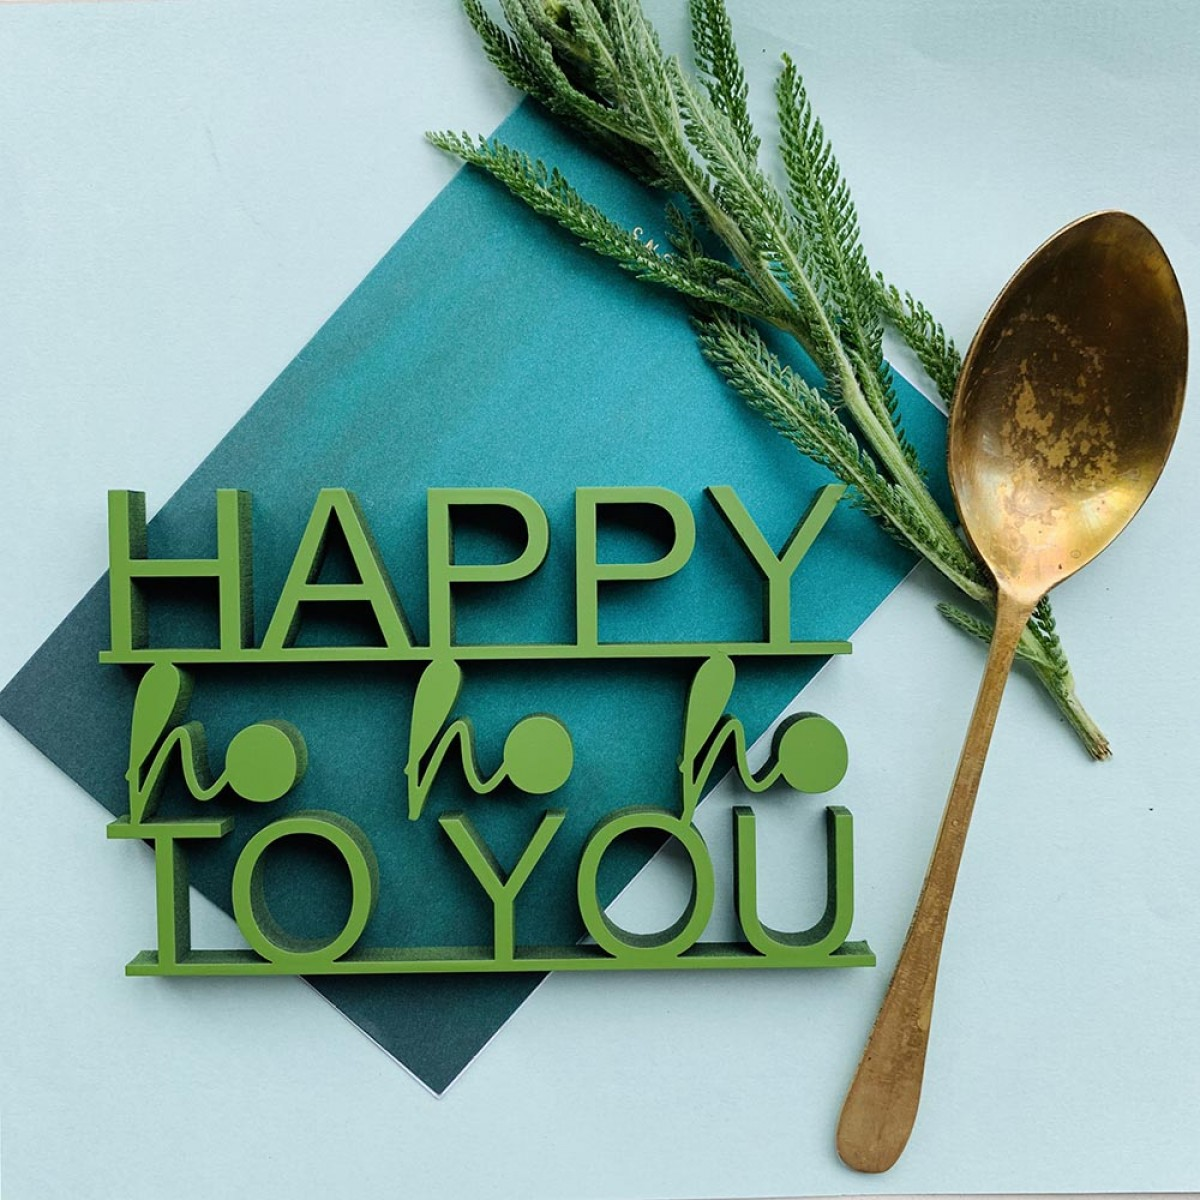 NOGALLERY Happy ho ho ho to you - Deko Schriftzug Holz